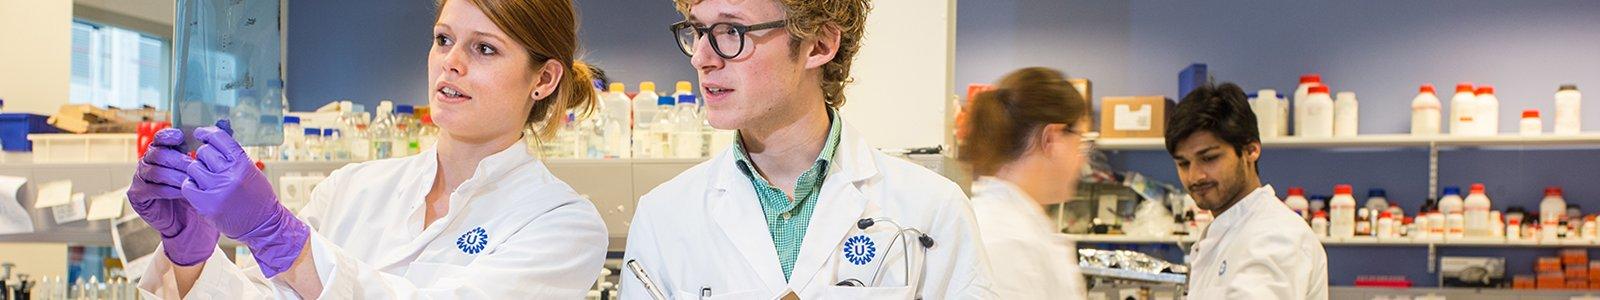 Contact - Faculty of Medicine - UMC Utrecht - Utrecht University